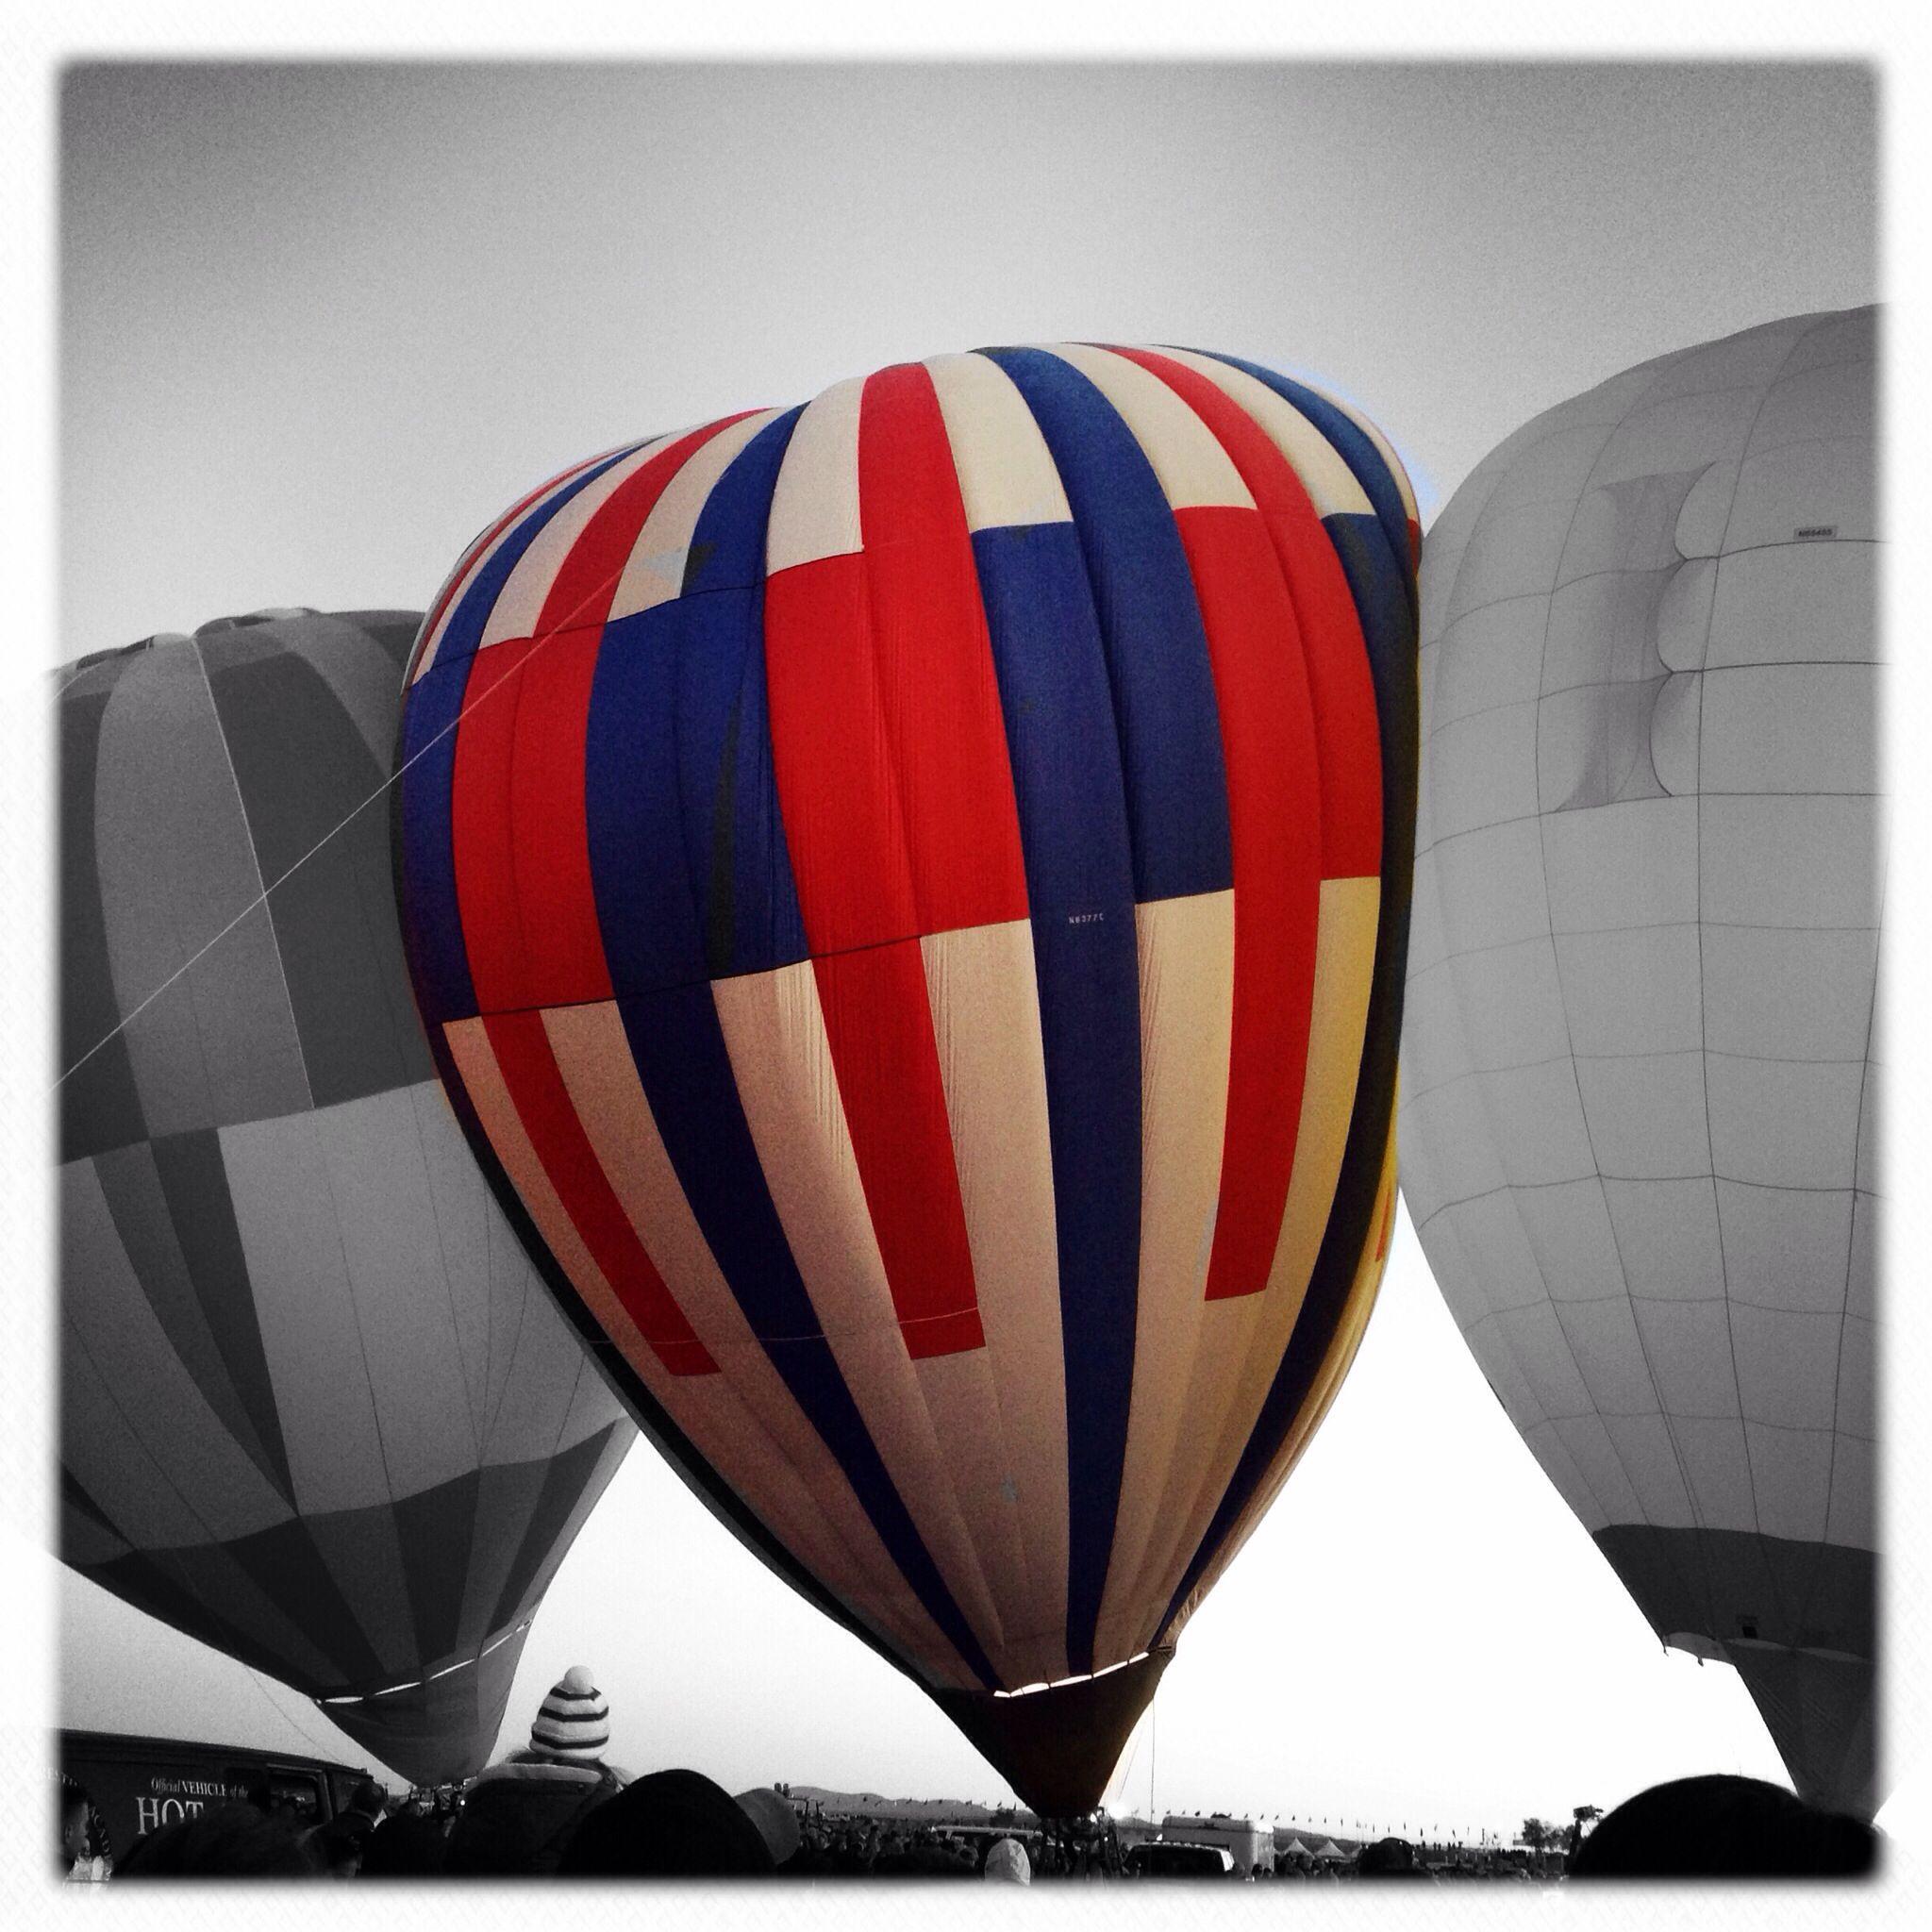 International Balloon Fiesta in Albuquerque